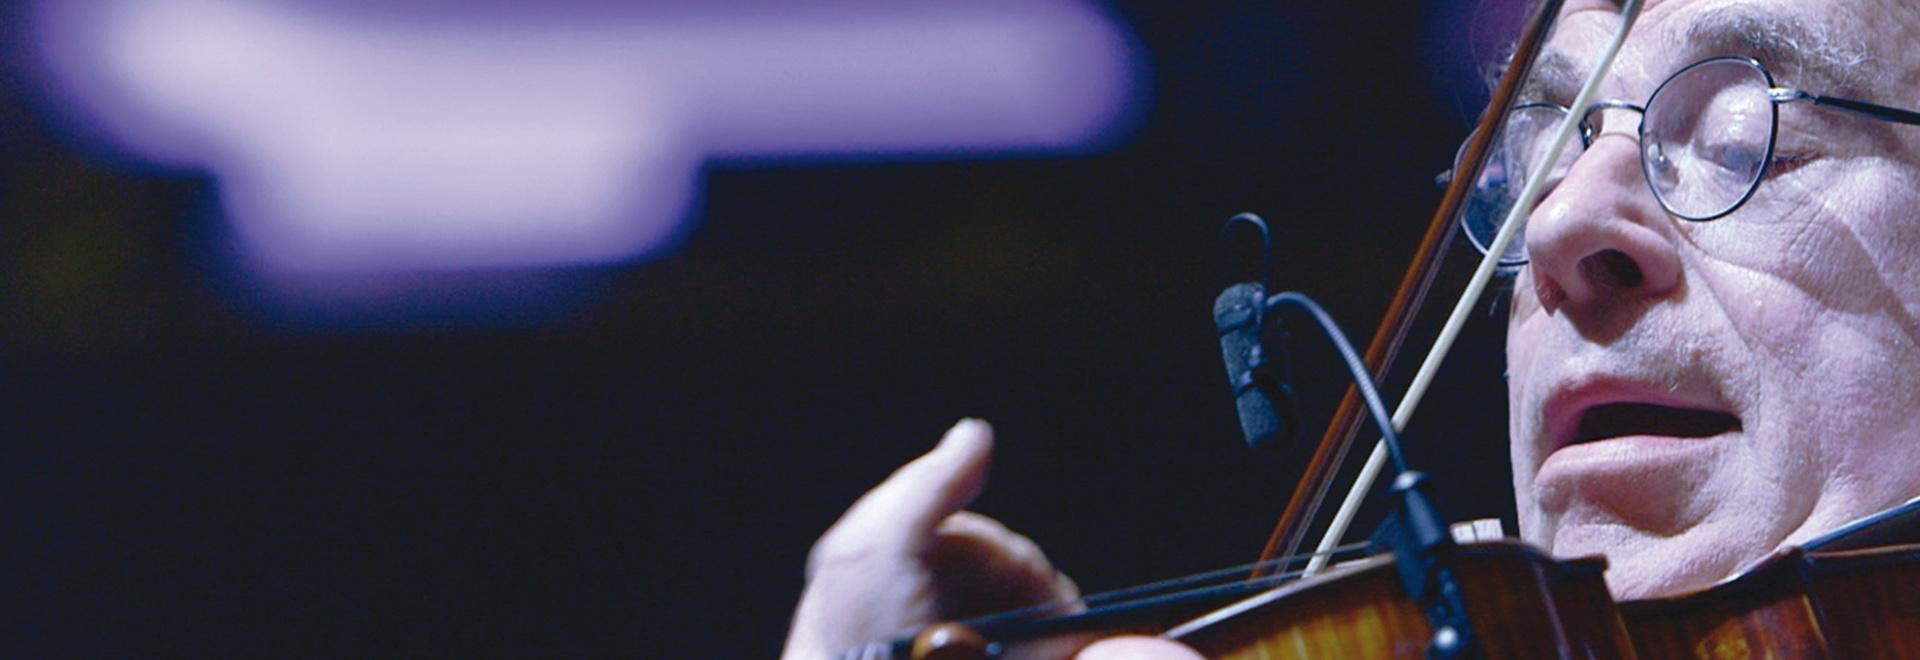 Itzhak Perlman - Una vita per il violino